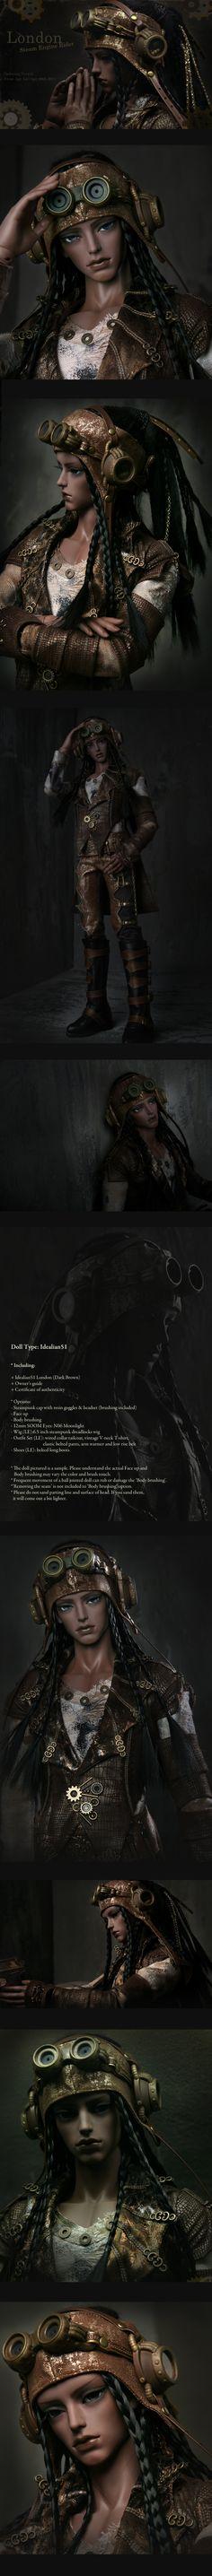 "the SOOM emporium:  ""Idealian51 - London Steam Engine Rider"""